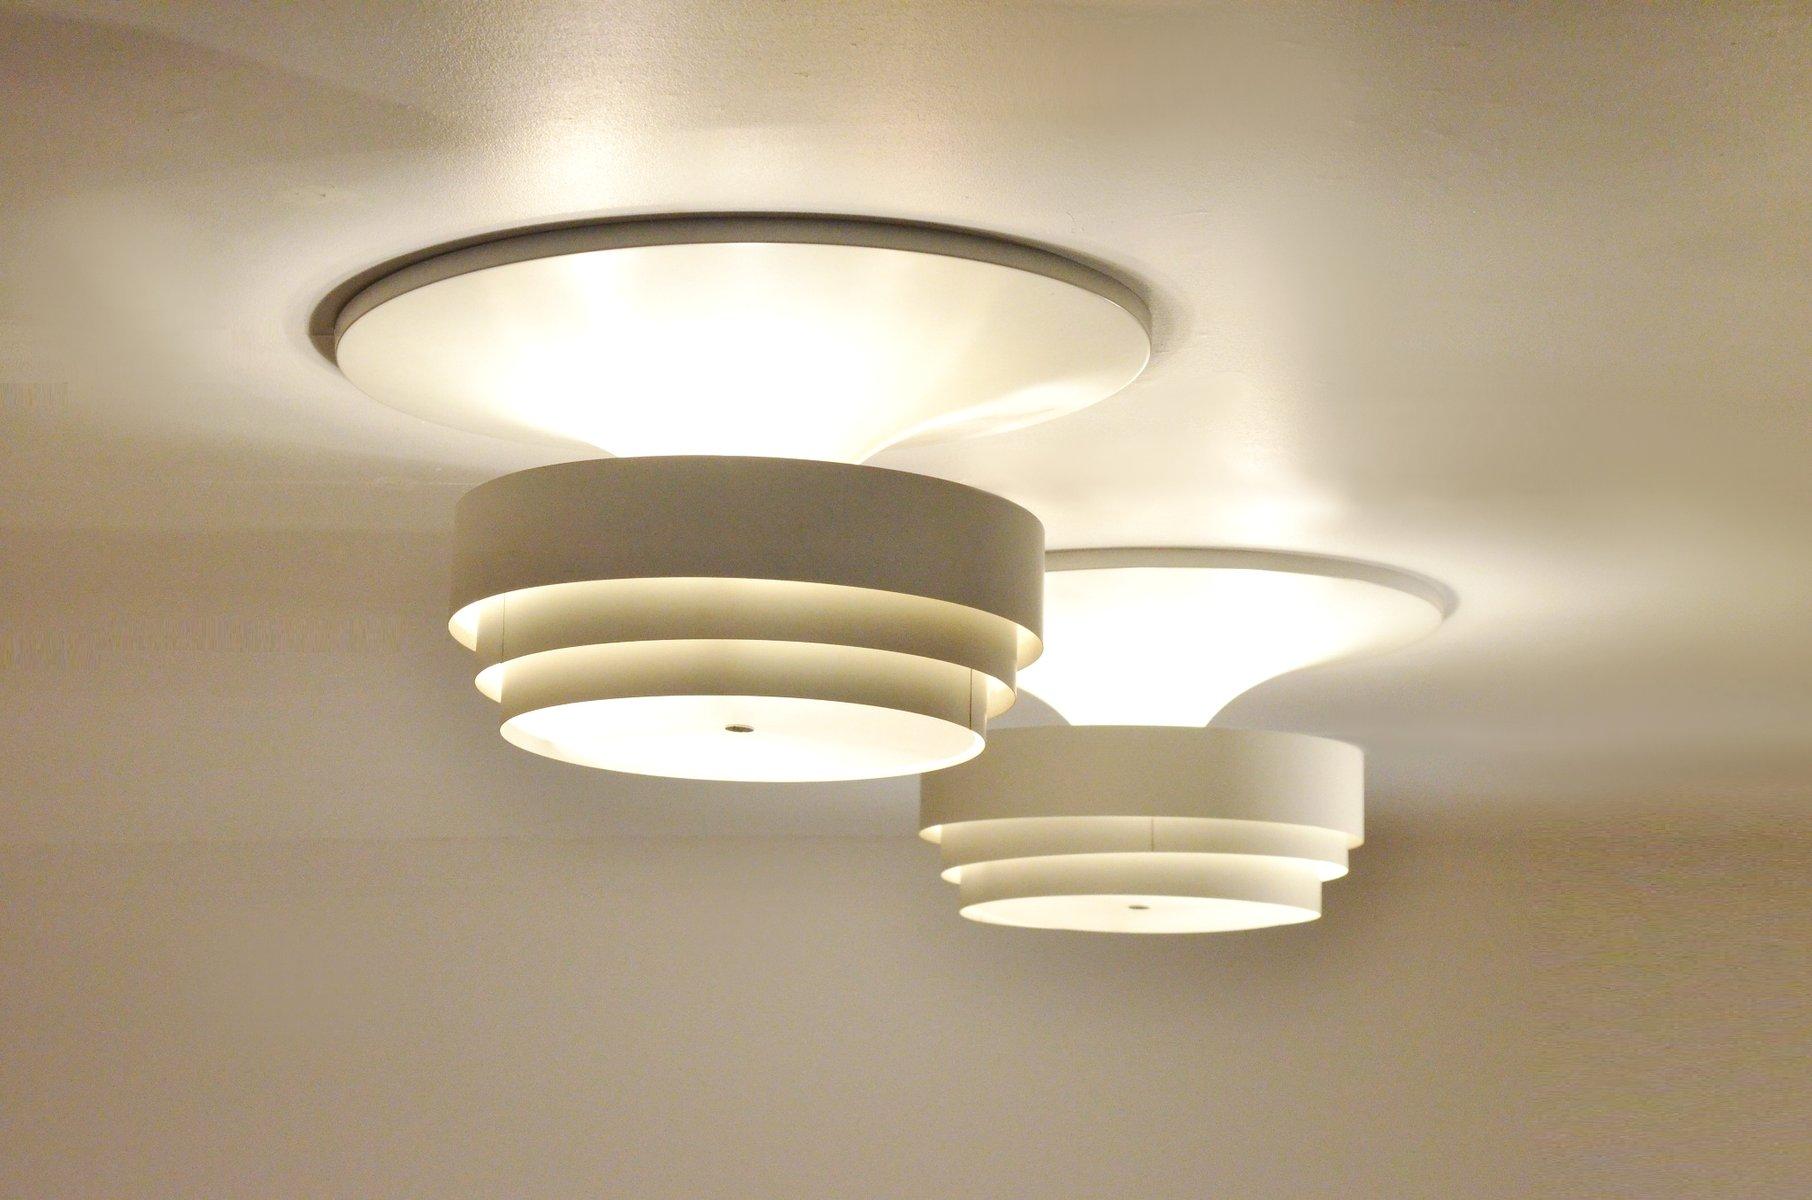 gro e wei e metall deckenlampe von hans agne jakobsson f r. Black Bedroom Furniture Sets. Home Design Ideas